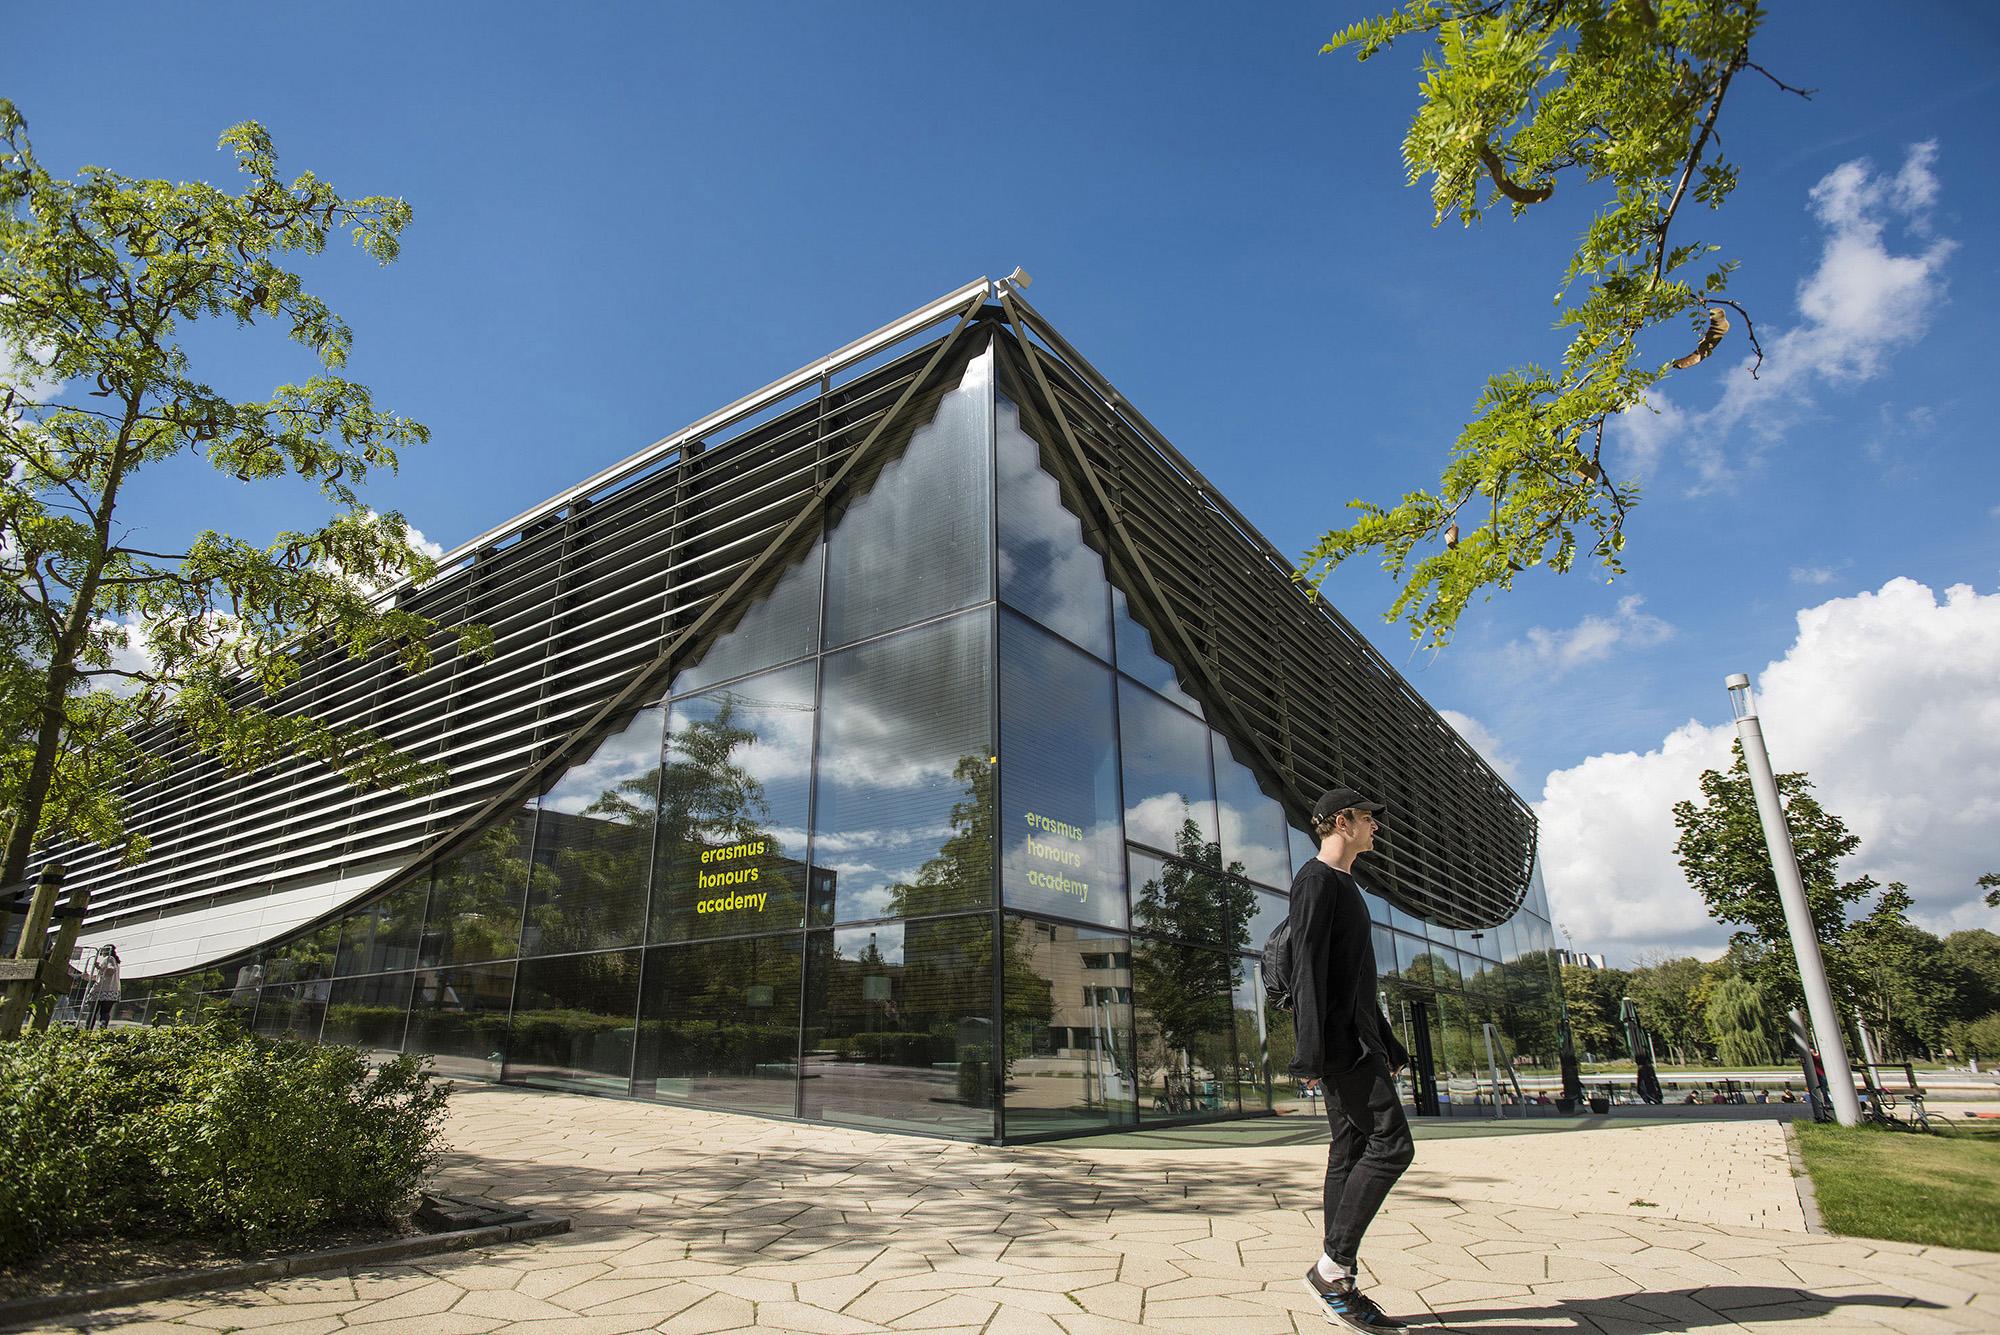 erasmus-paviljoen-erasmus-honours-academy